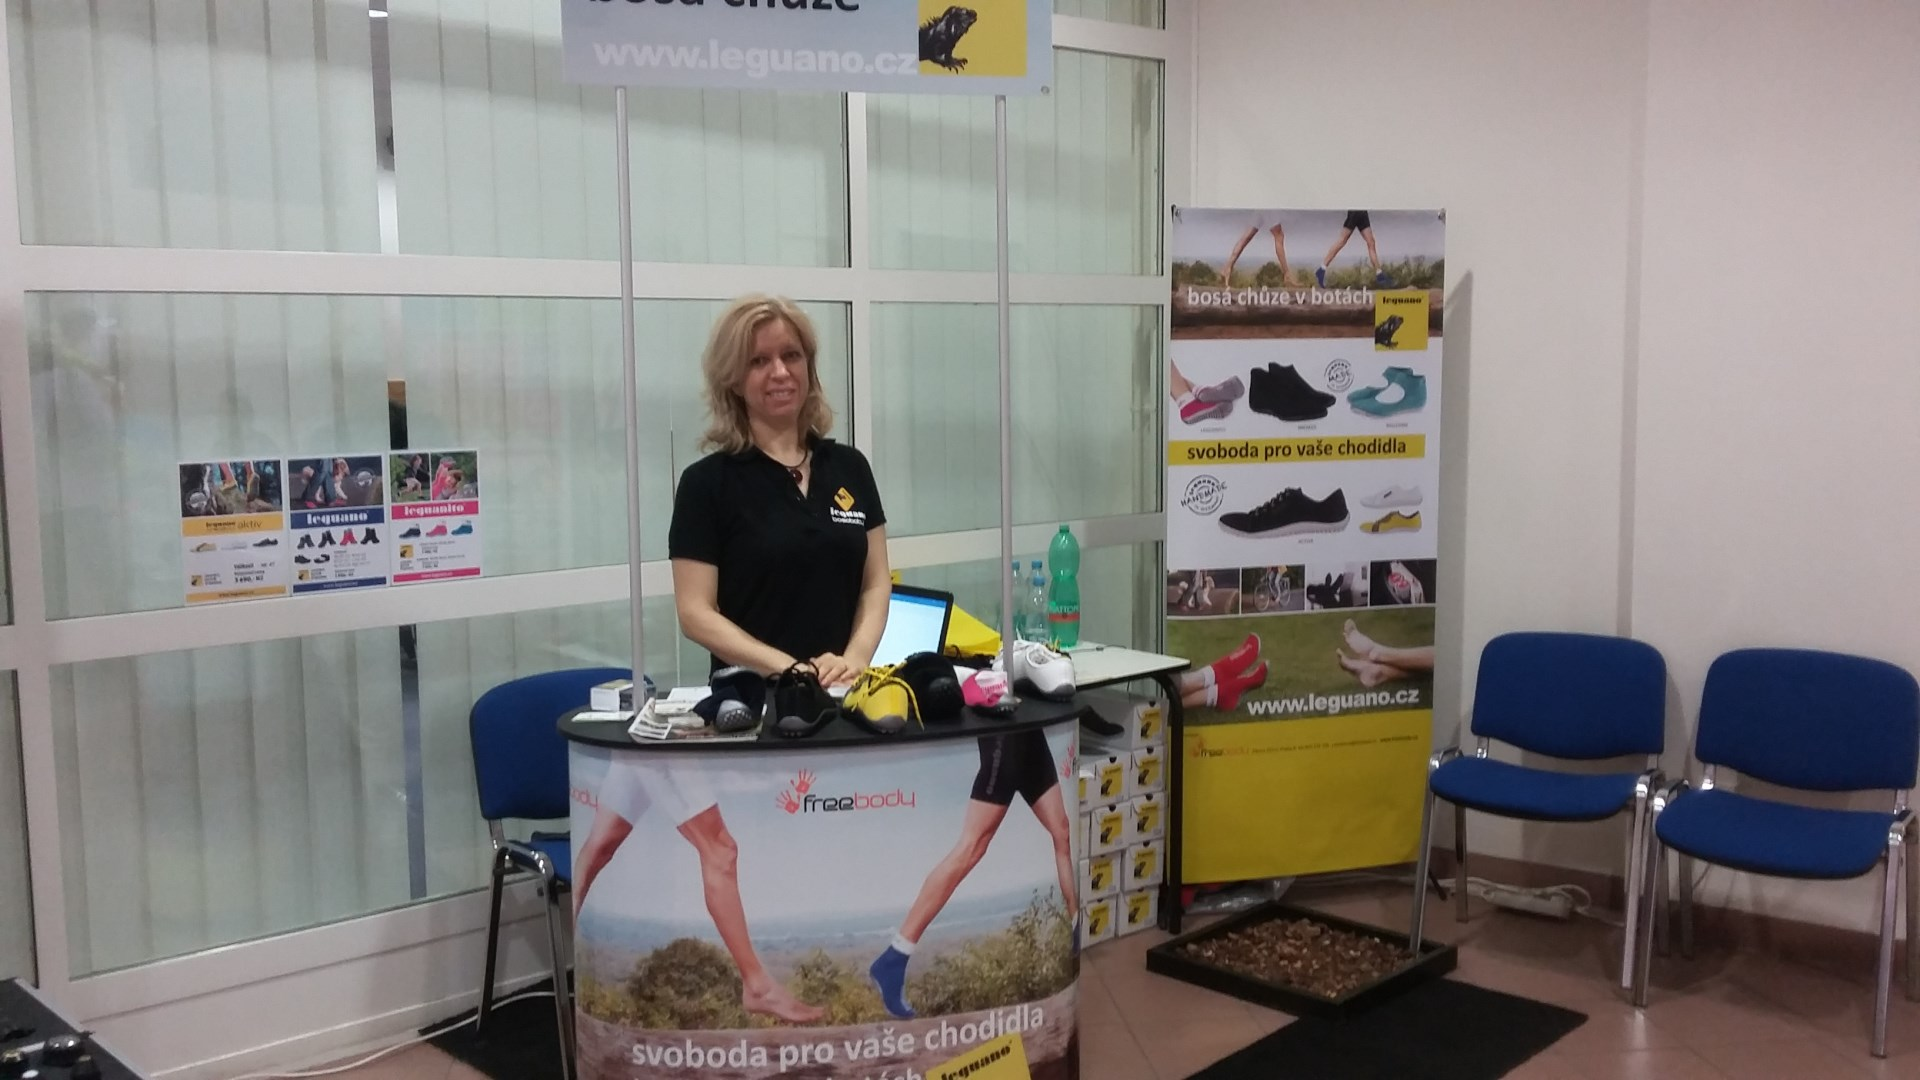 leguan - fyzioterapeut